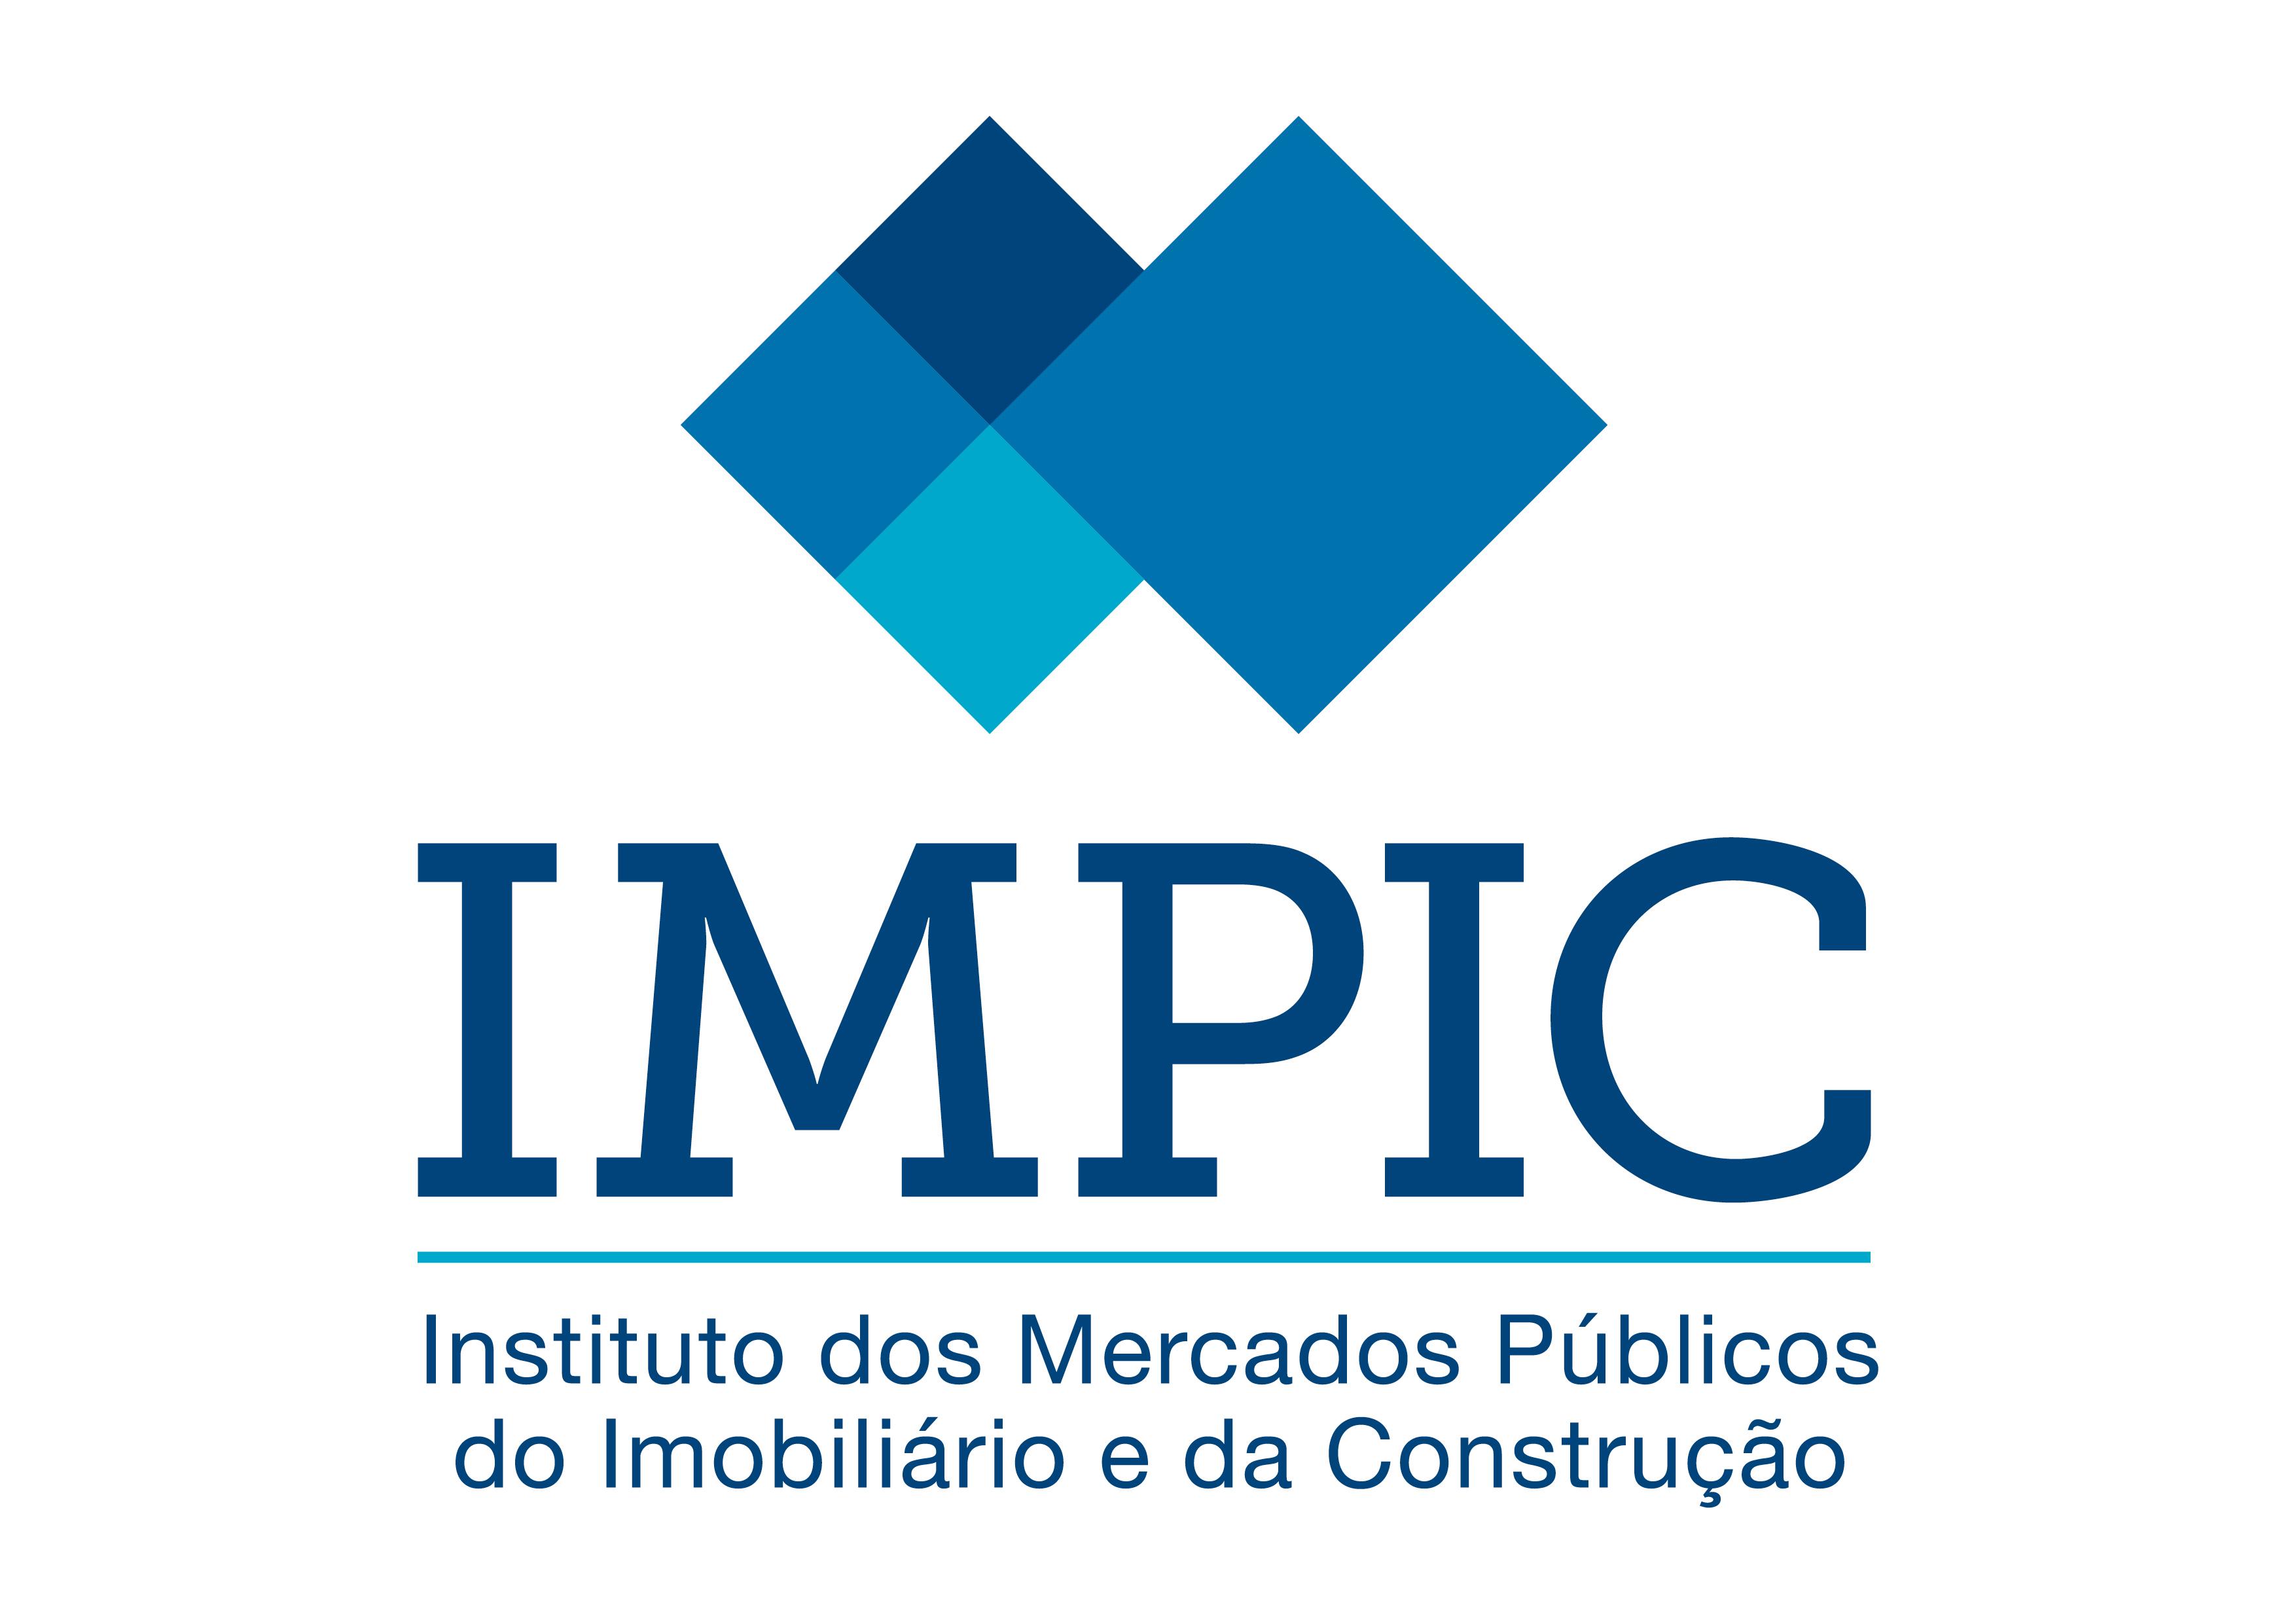 https://www.impic.pt/impic/assets/misc/img/slideshow/IMPIC_assinatura1_300RGB.jpg